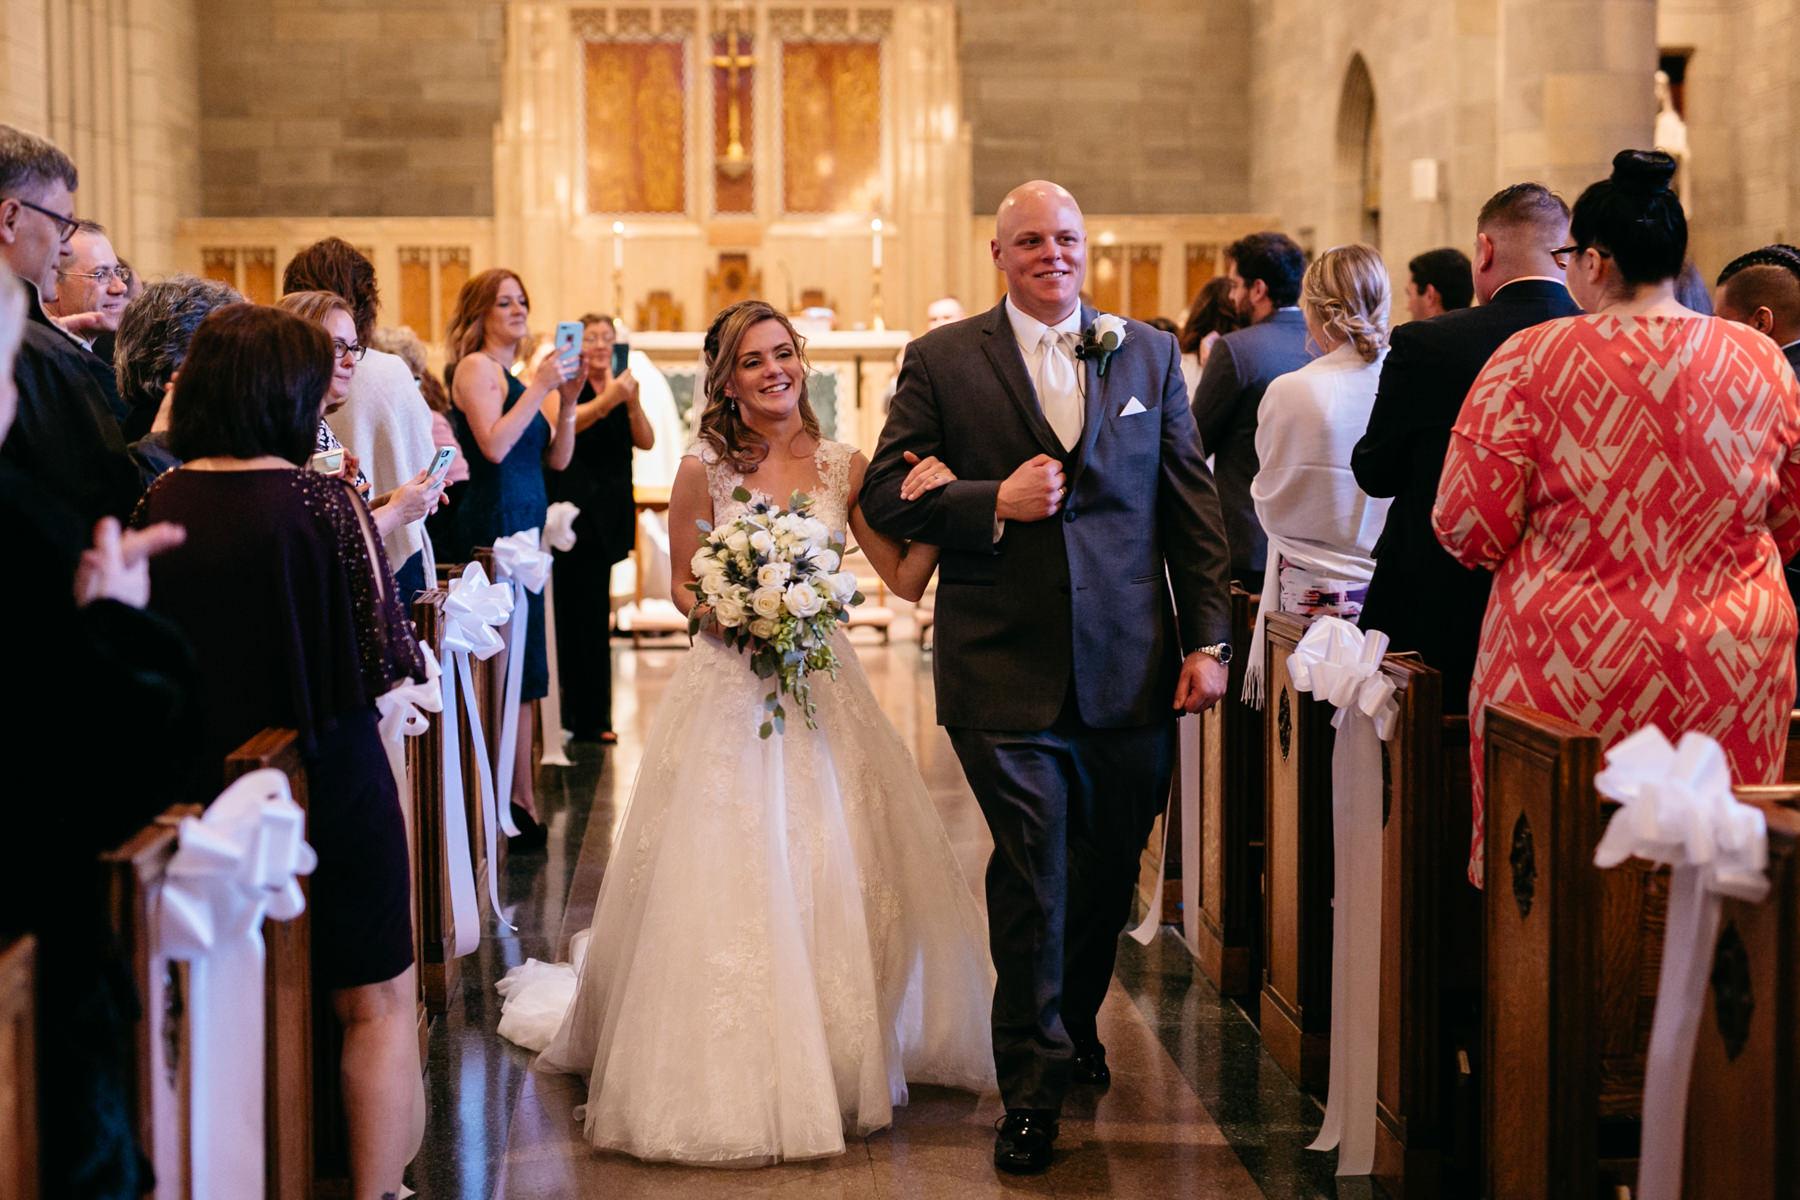 Quincy Ma Massachusetts Wedding Dedham Boston Granie Links Wedding New England Catholic Cathedral Liz Osban Photography 54.jpg